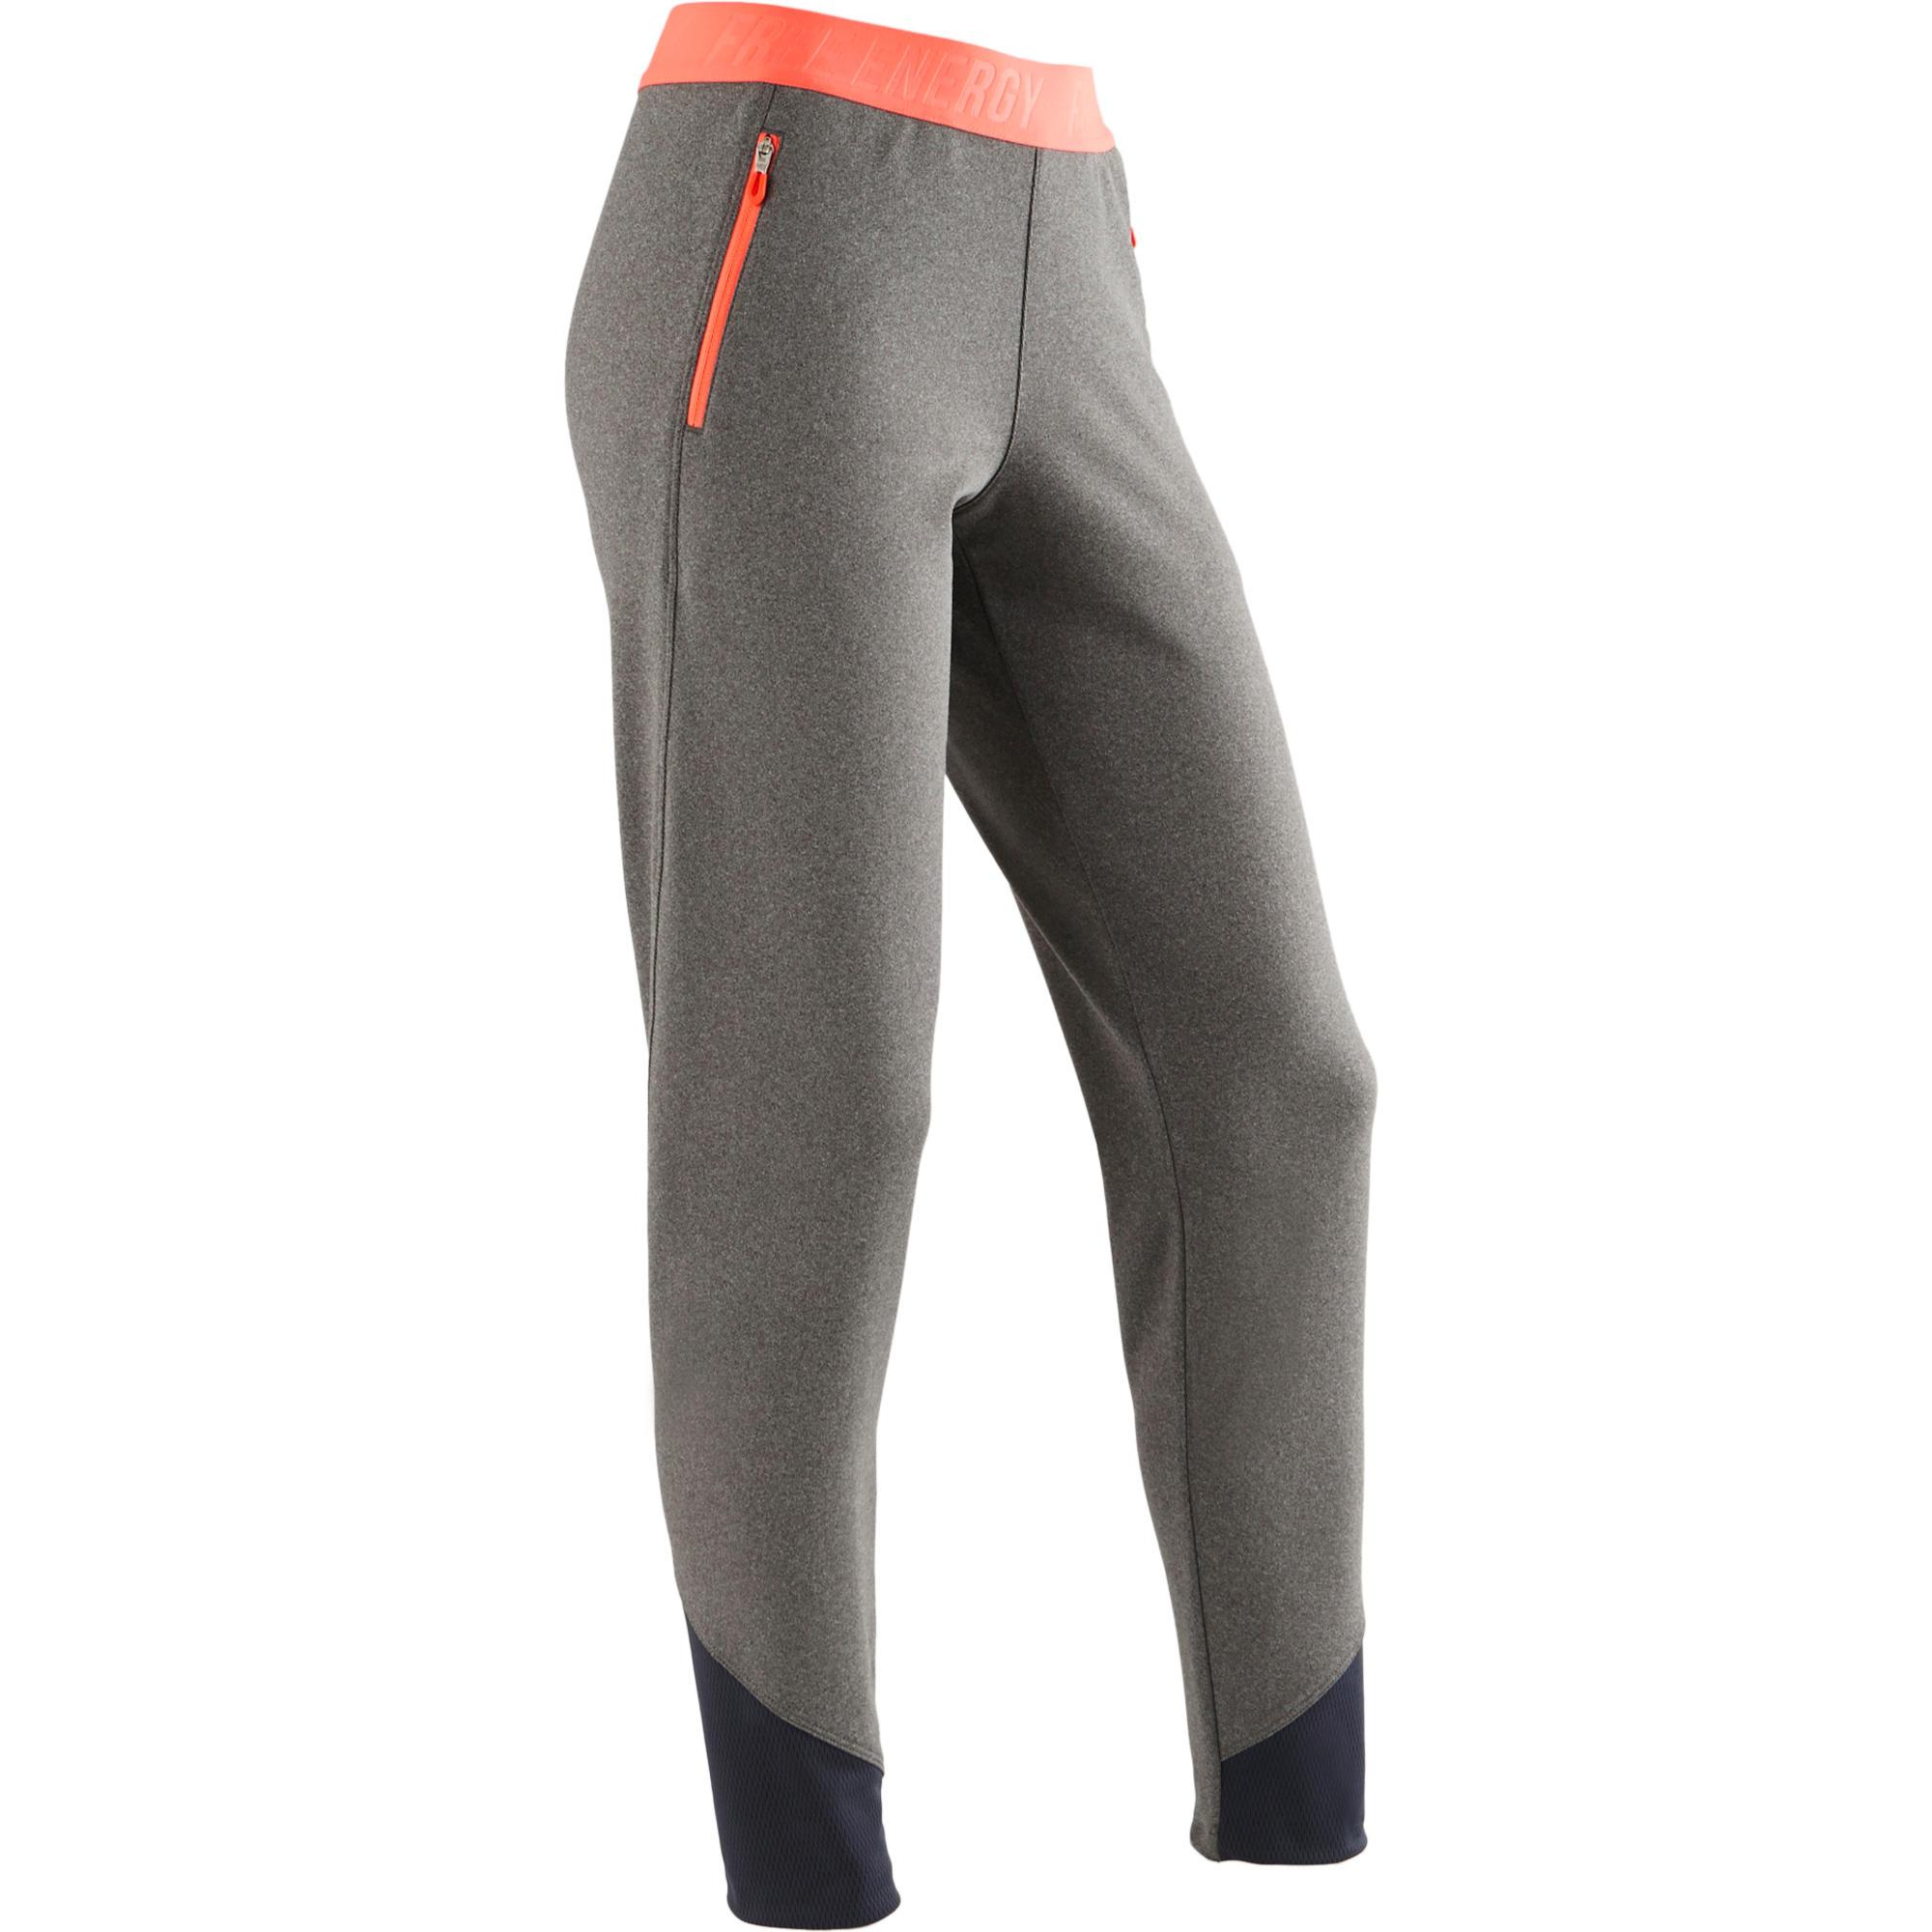 S900 Girls' Slim-Fit Gym Bottoms - Grey